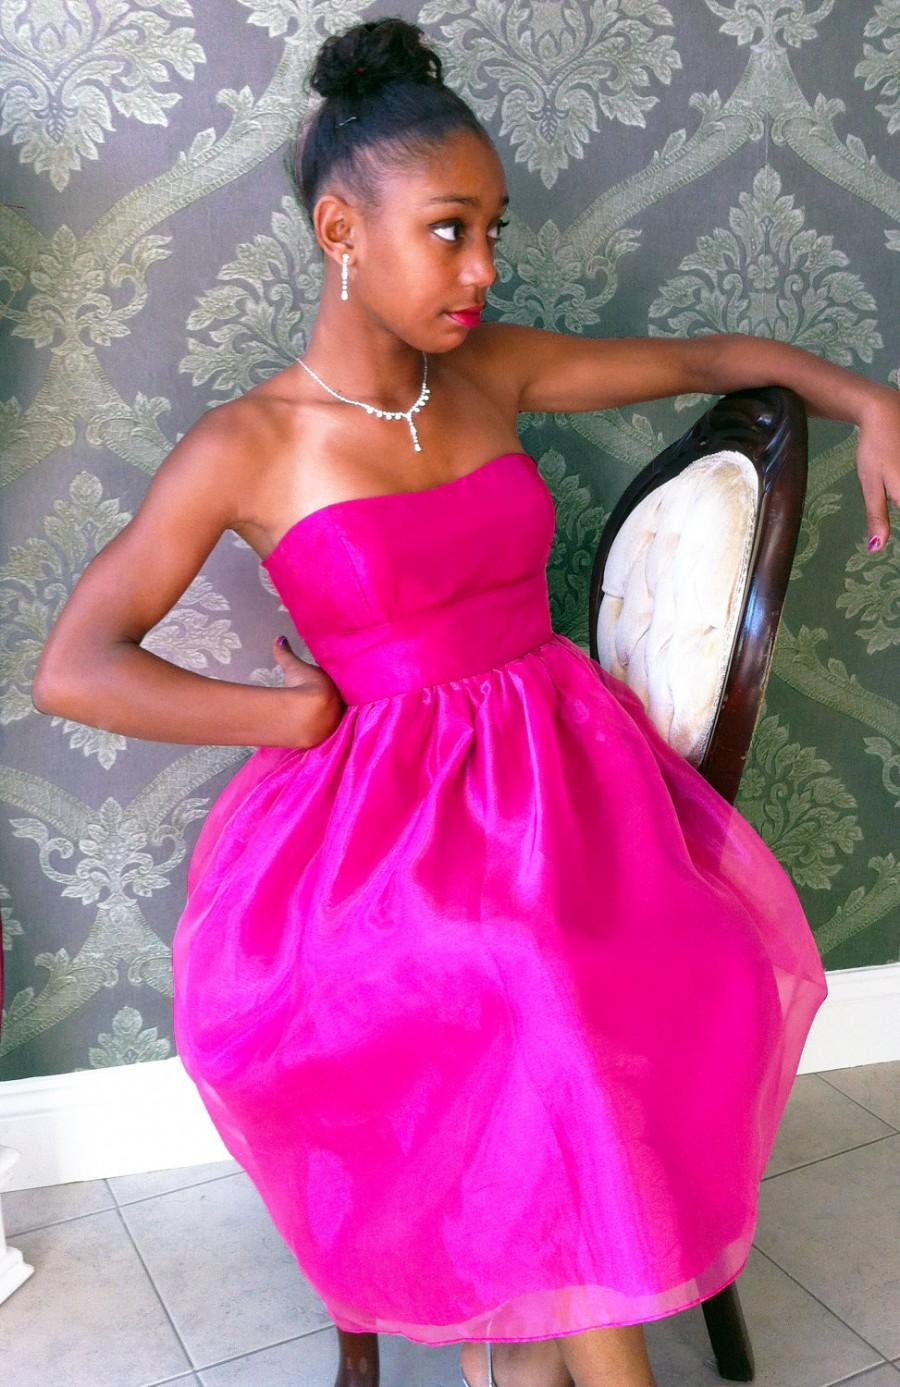 Bridal Bridesmaids Dresses, Short Maids Dresses, Baby Doll ...